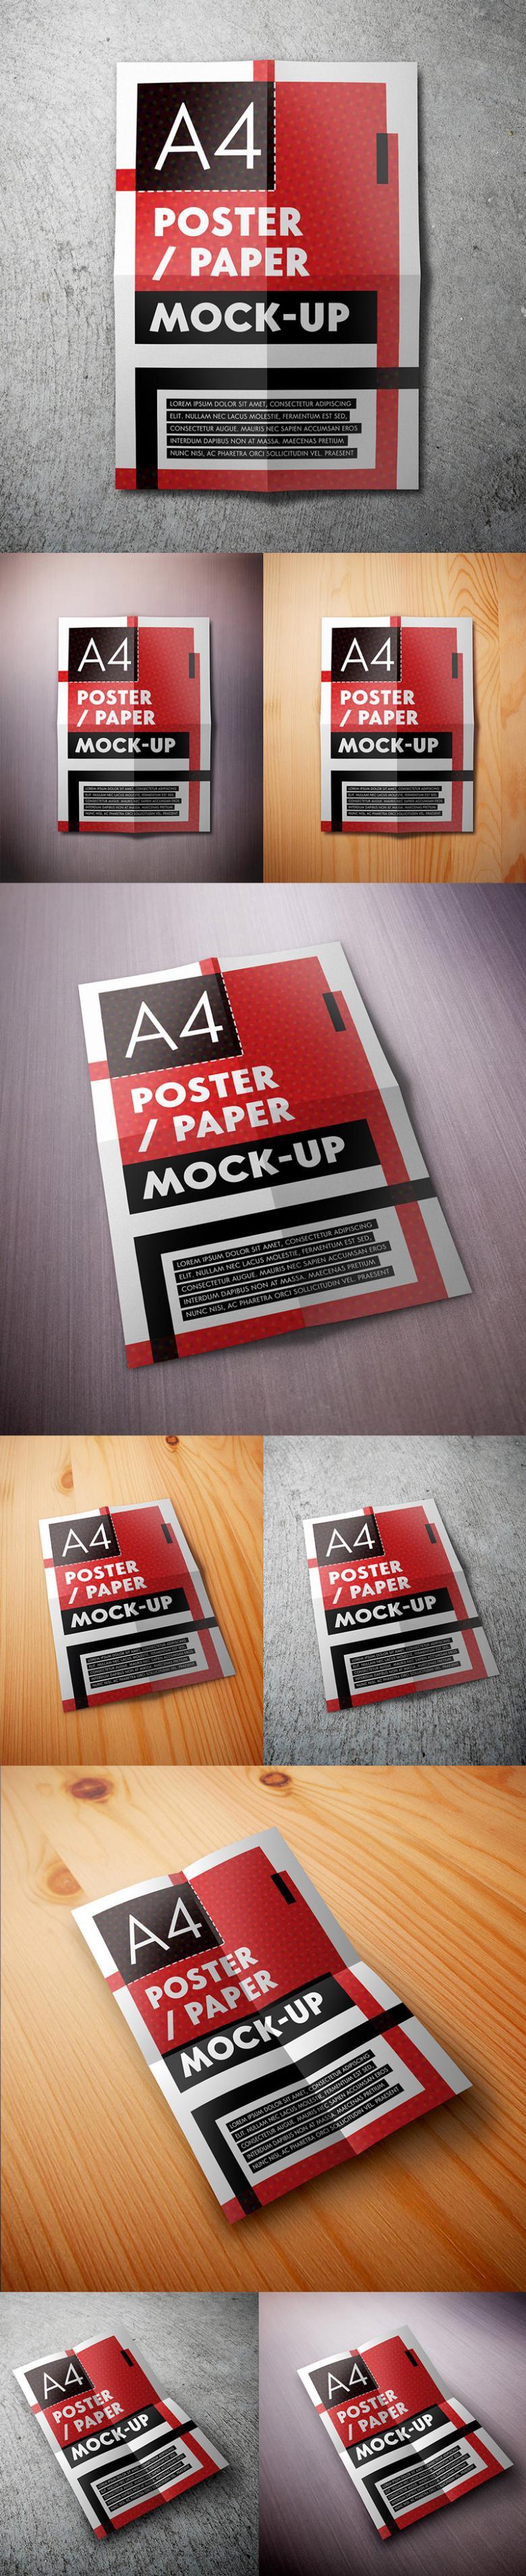 A4 Poster Mockups (With images) Poster mockup, Design